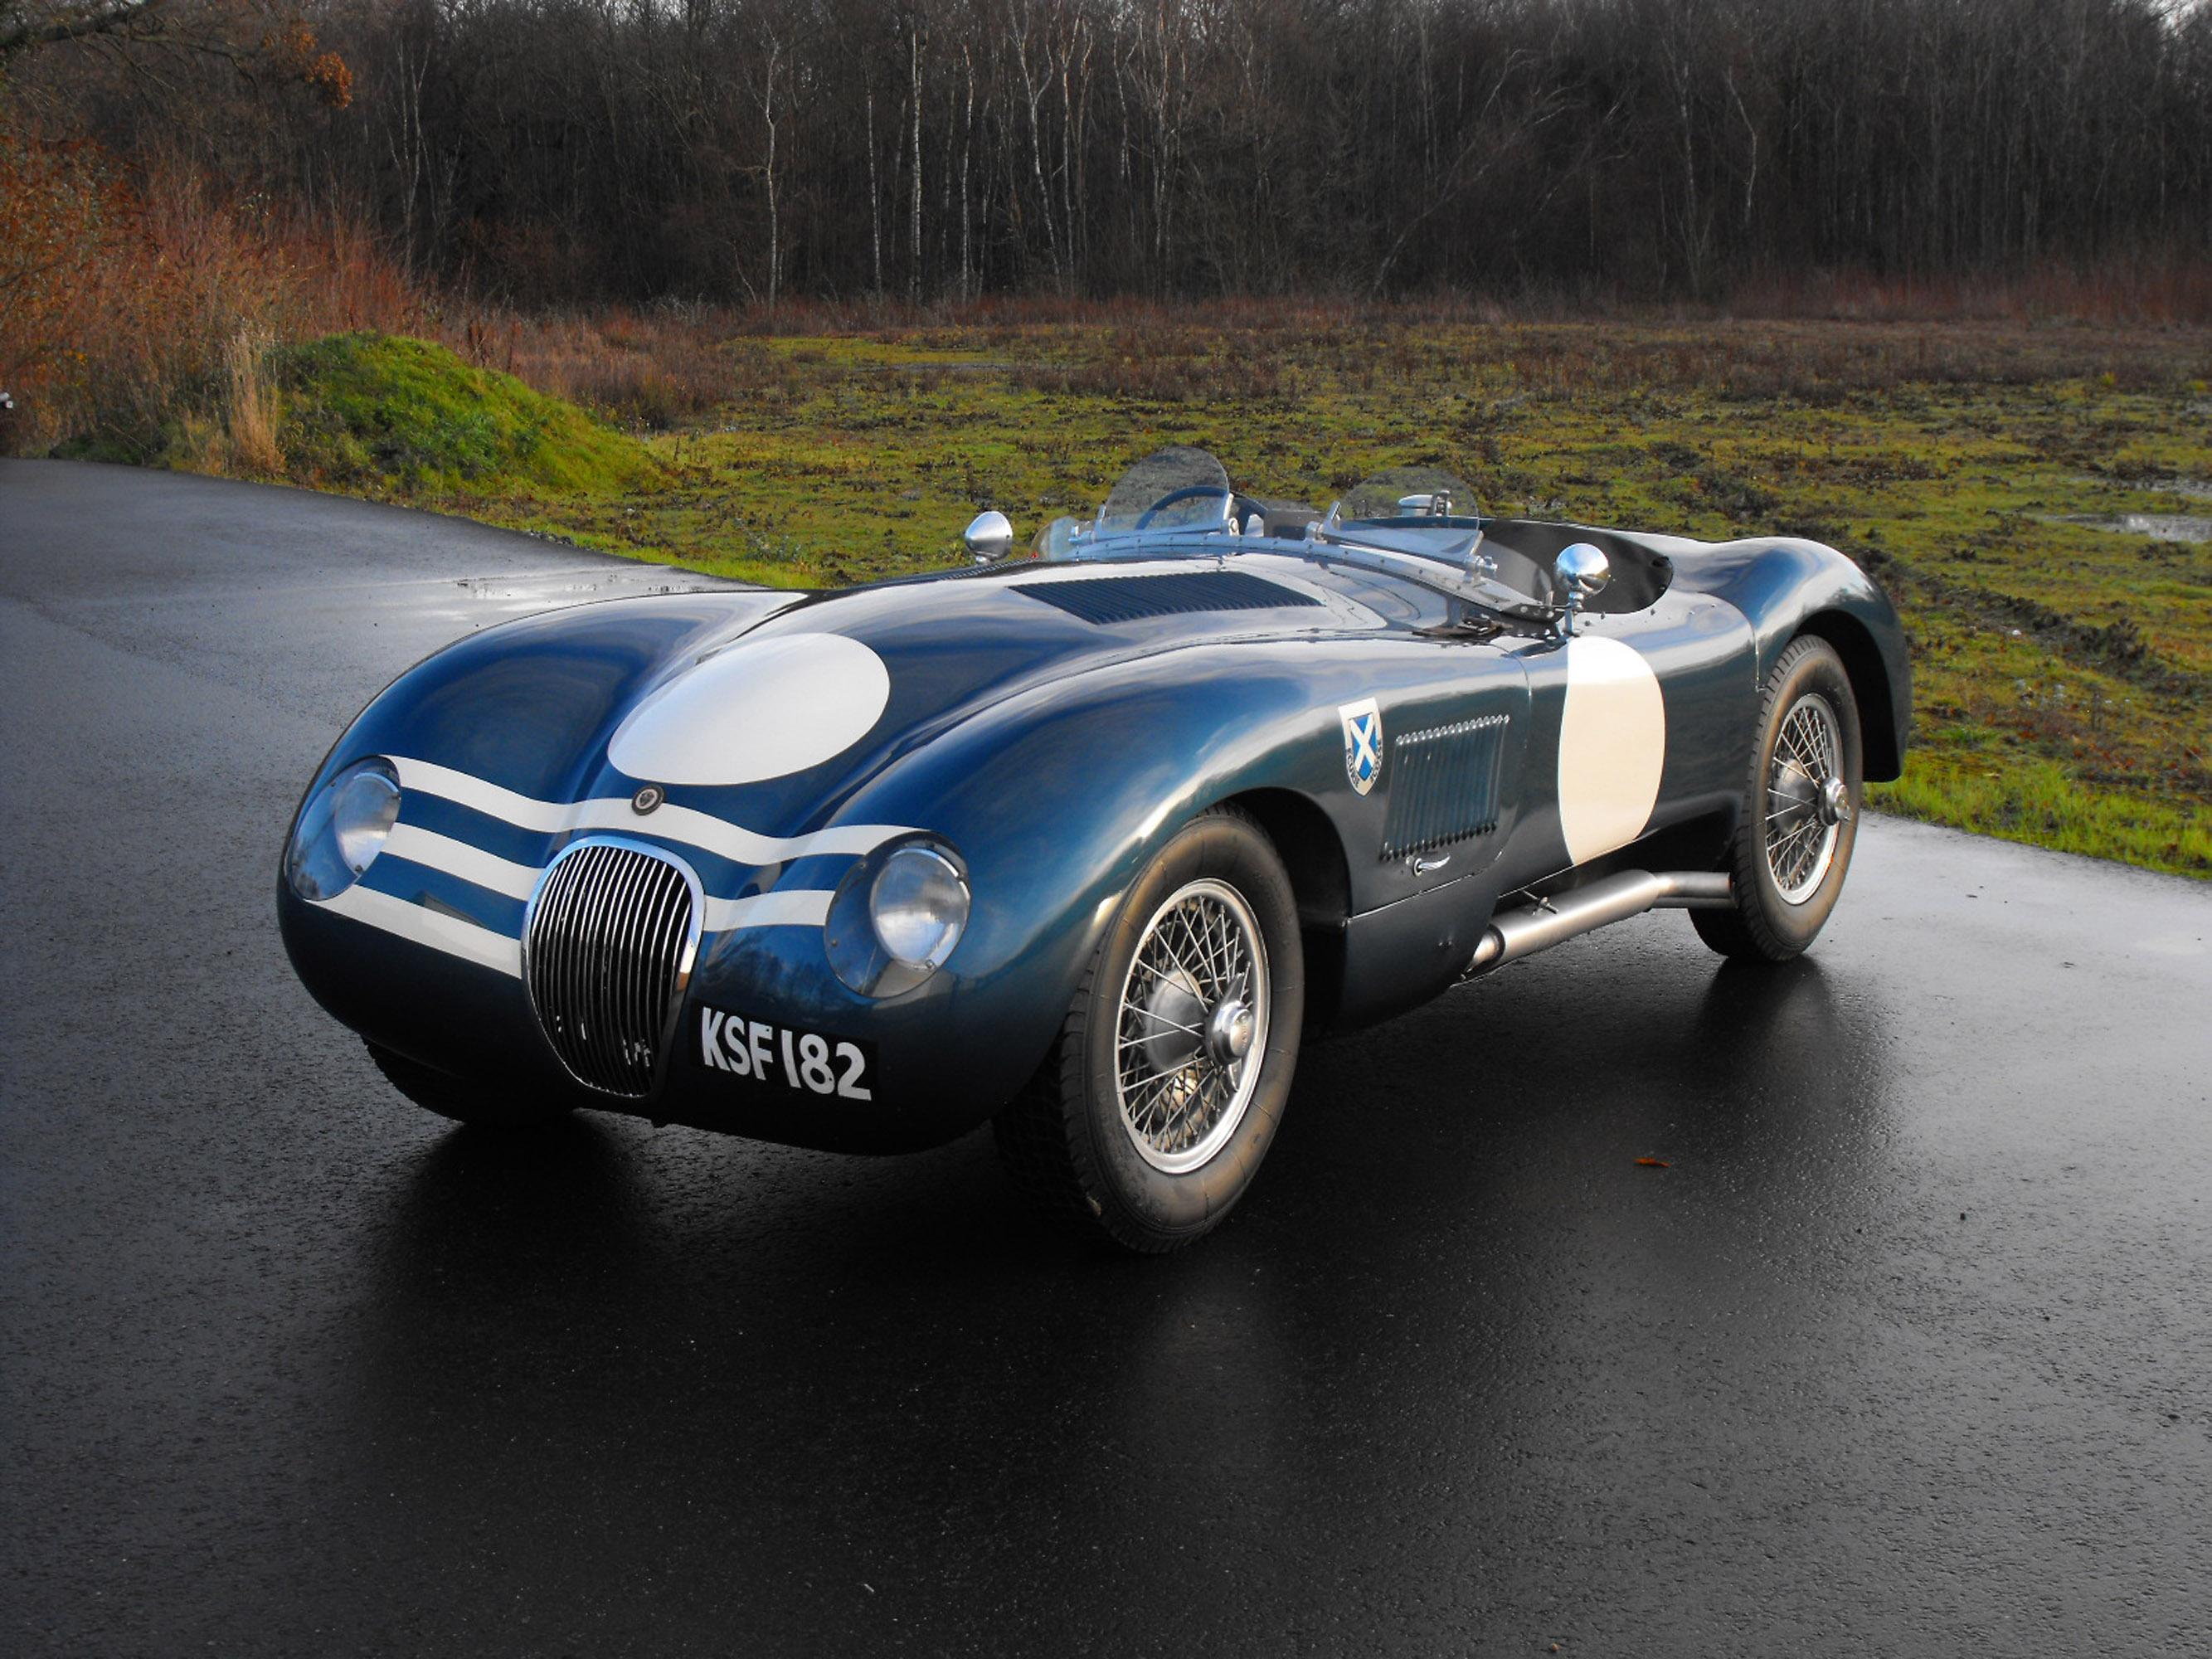 Classic Jaguar Models Come To Mille Migia